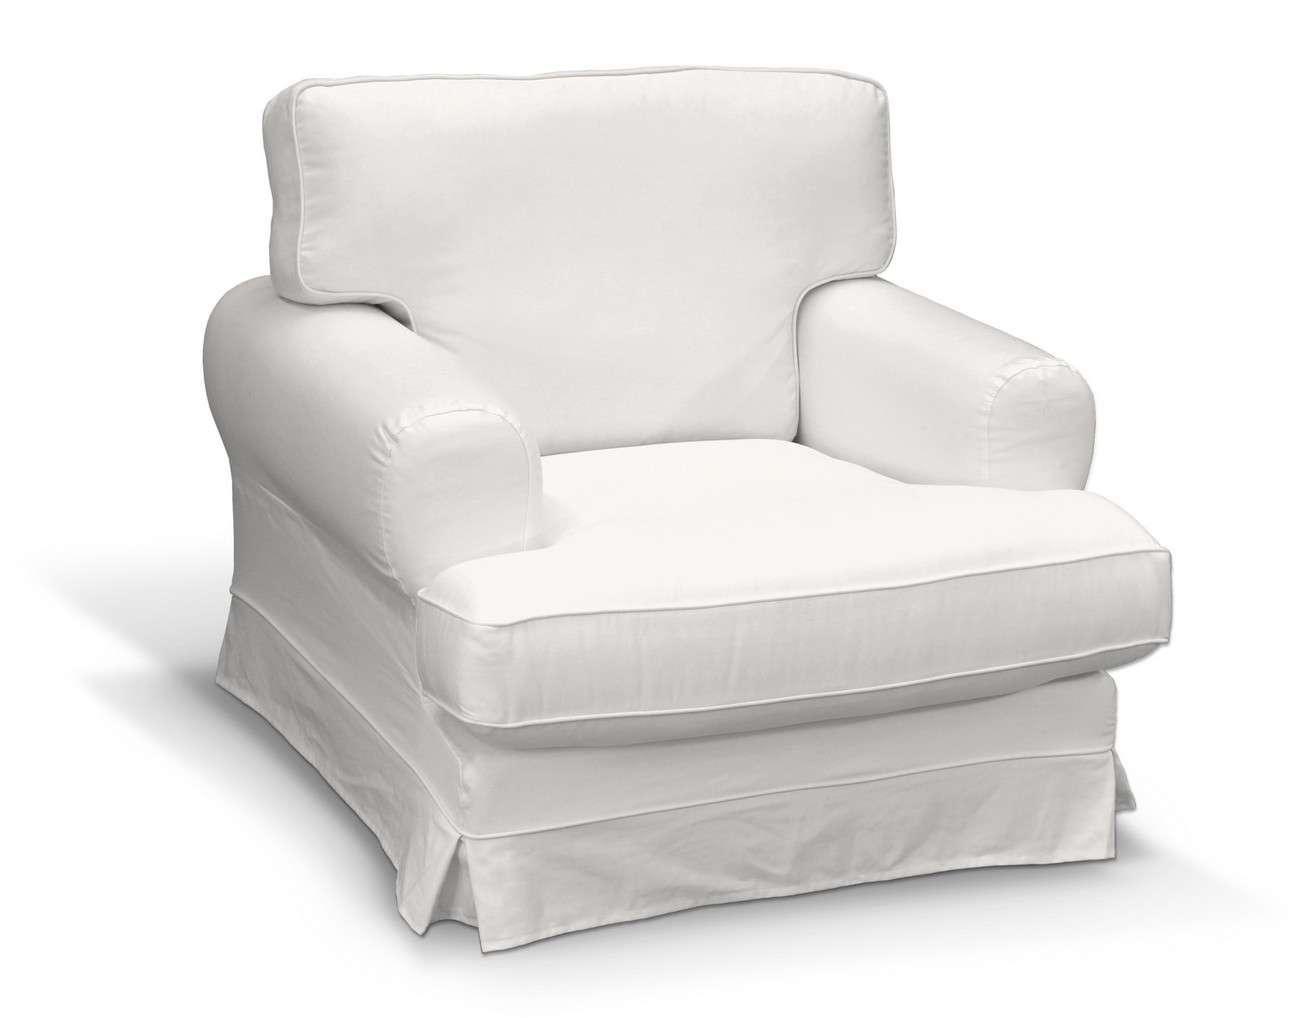 Ekeskog betræk lænestol fra kollektionen Cotton Panama, Stof: 702-34